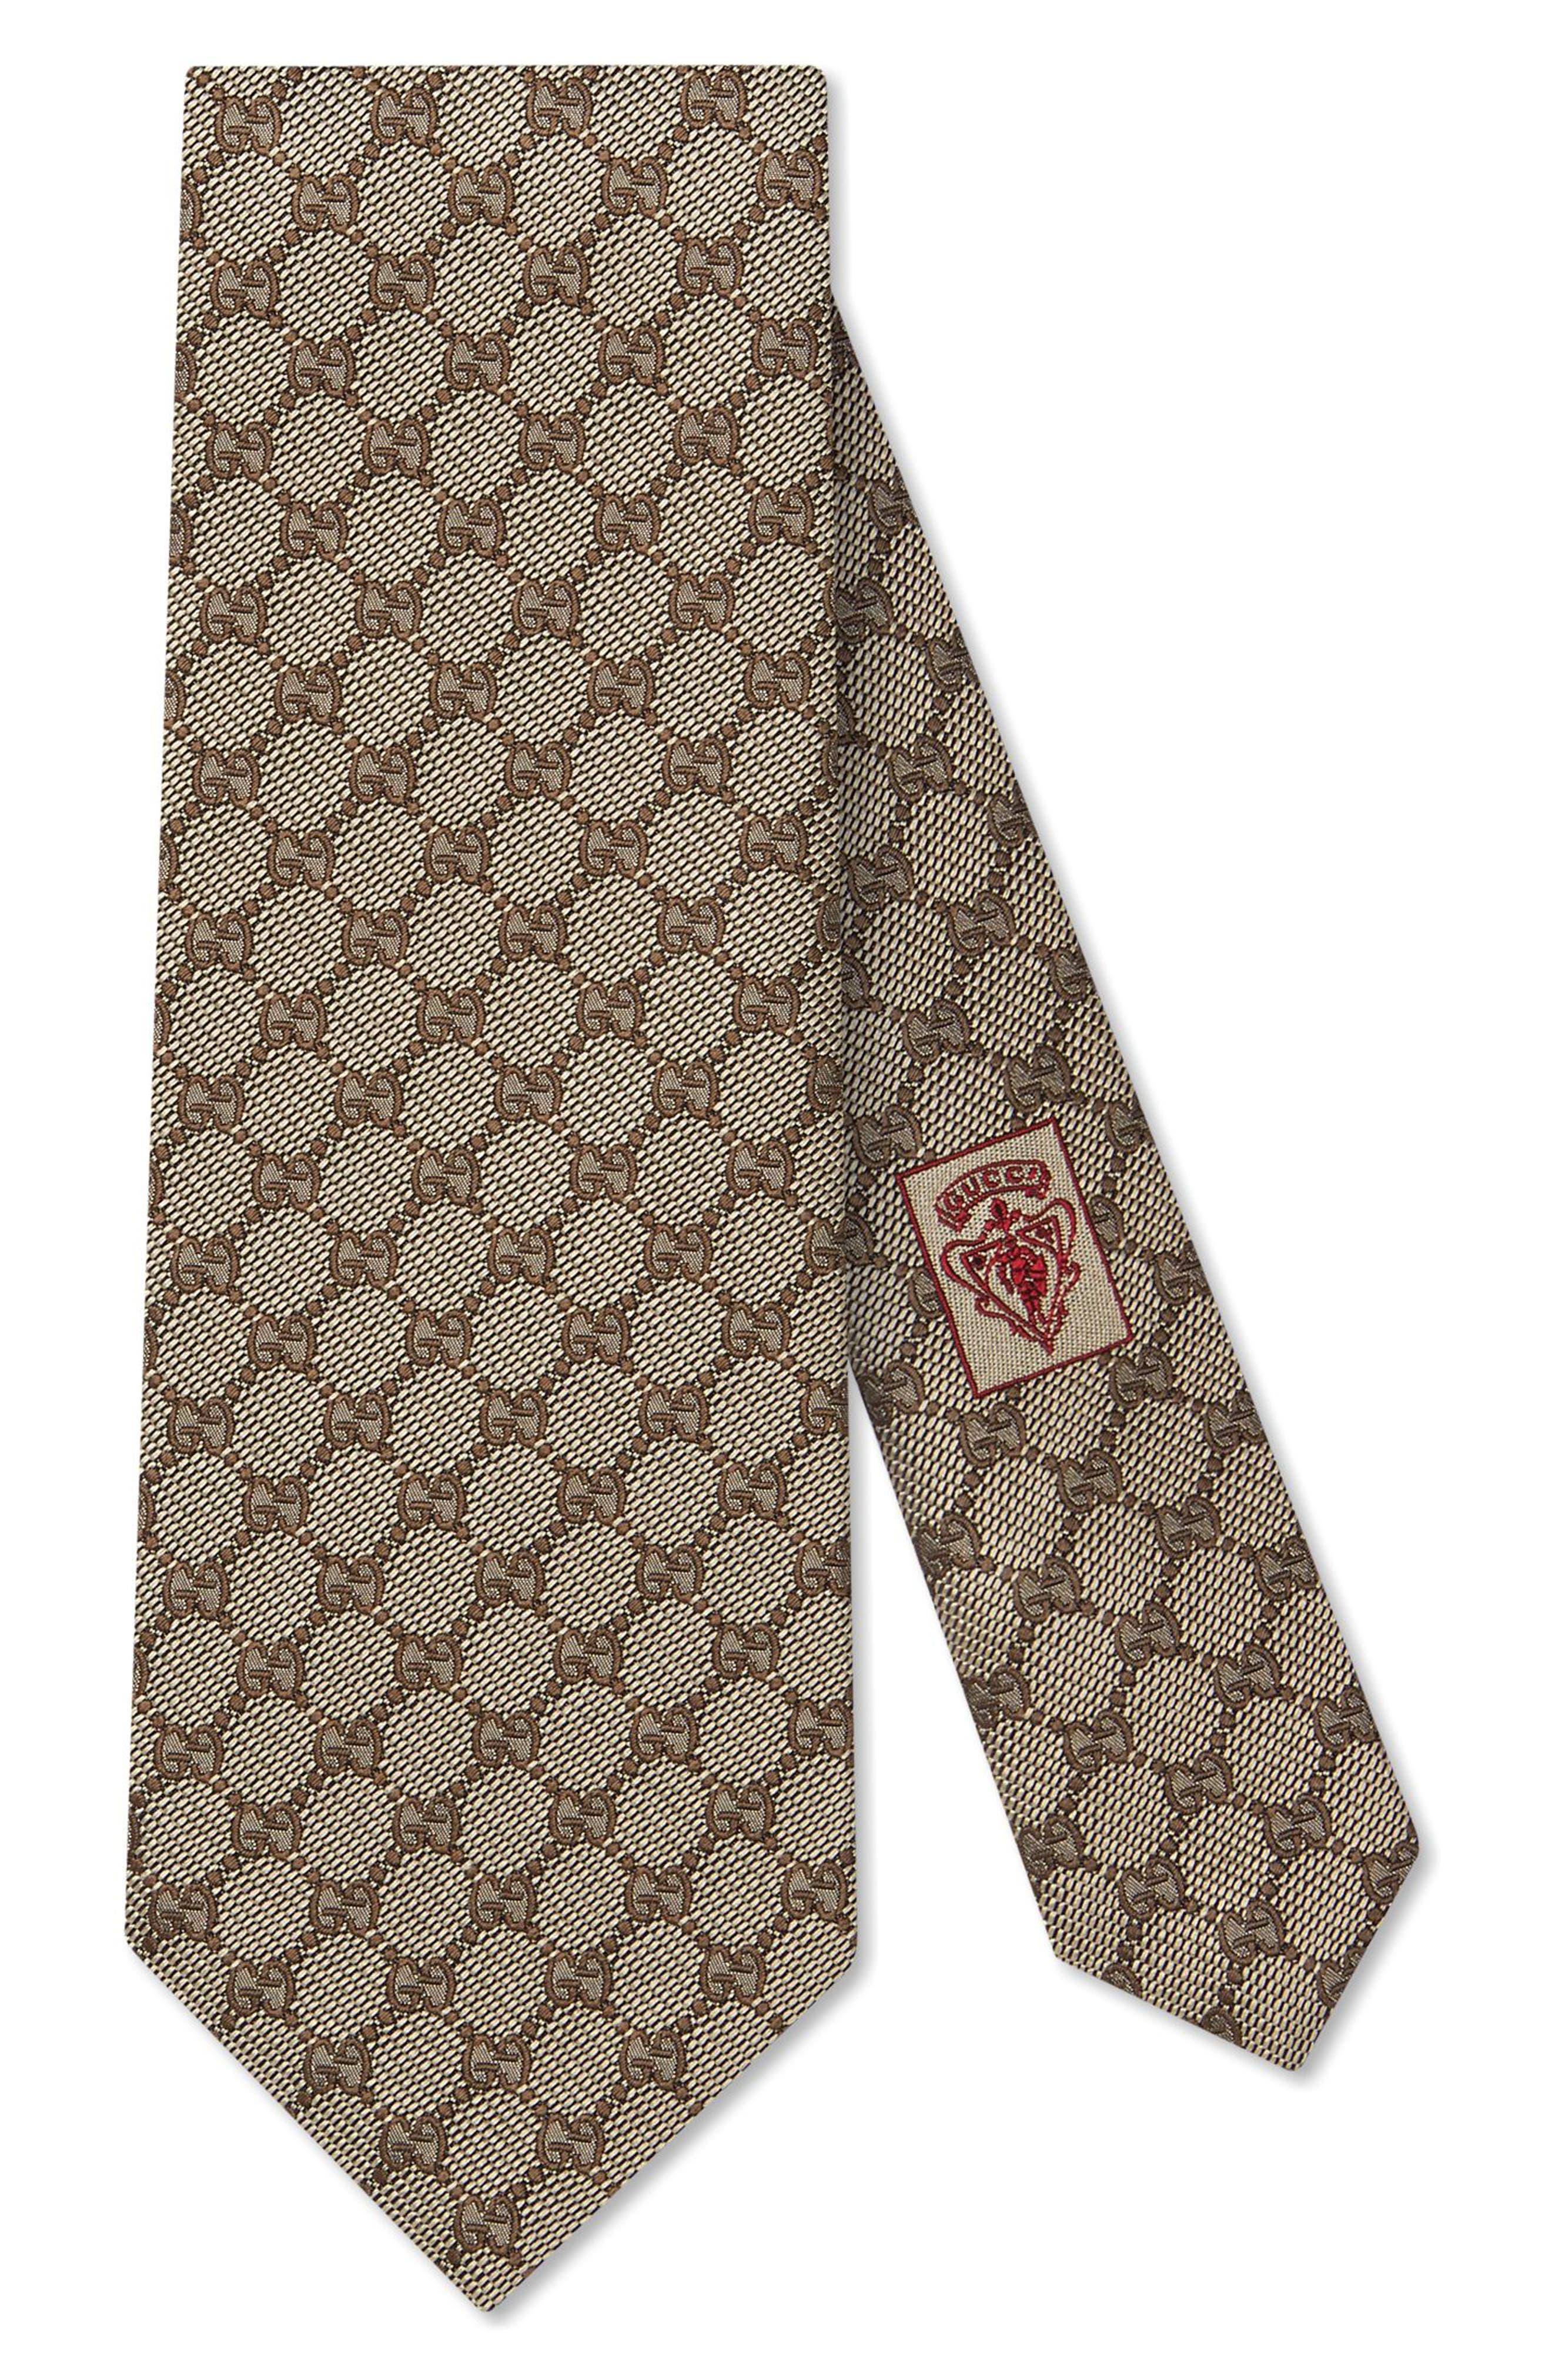 Gucci Arend Print Silk Tie